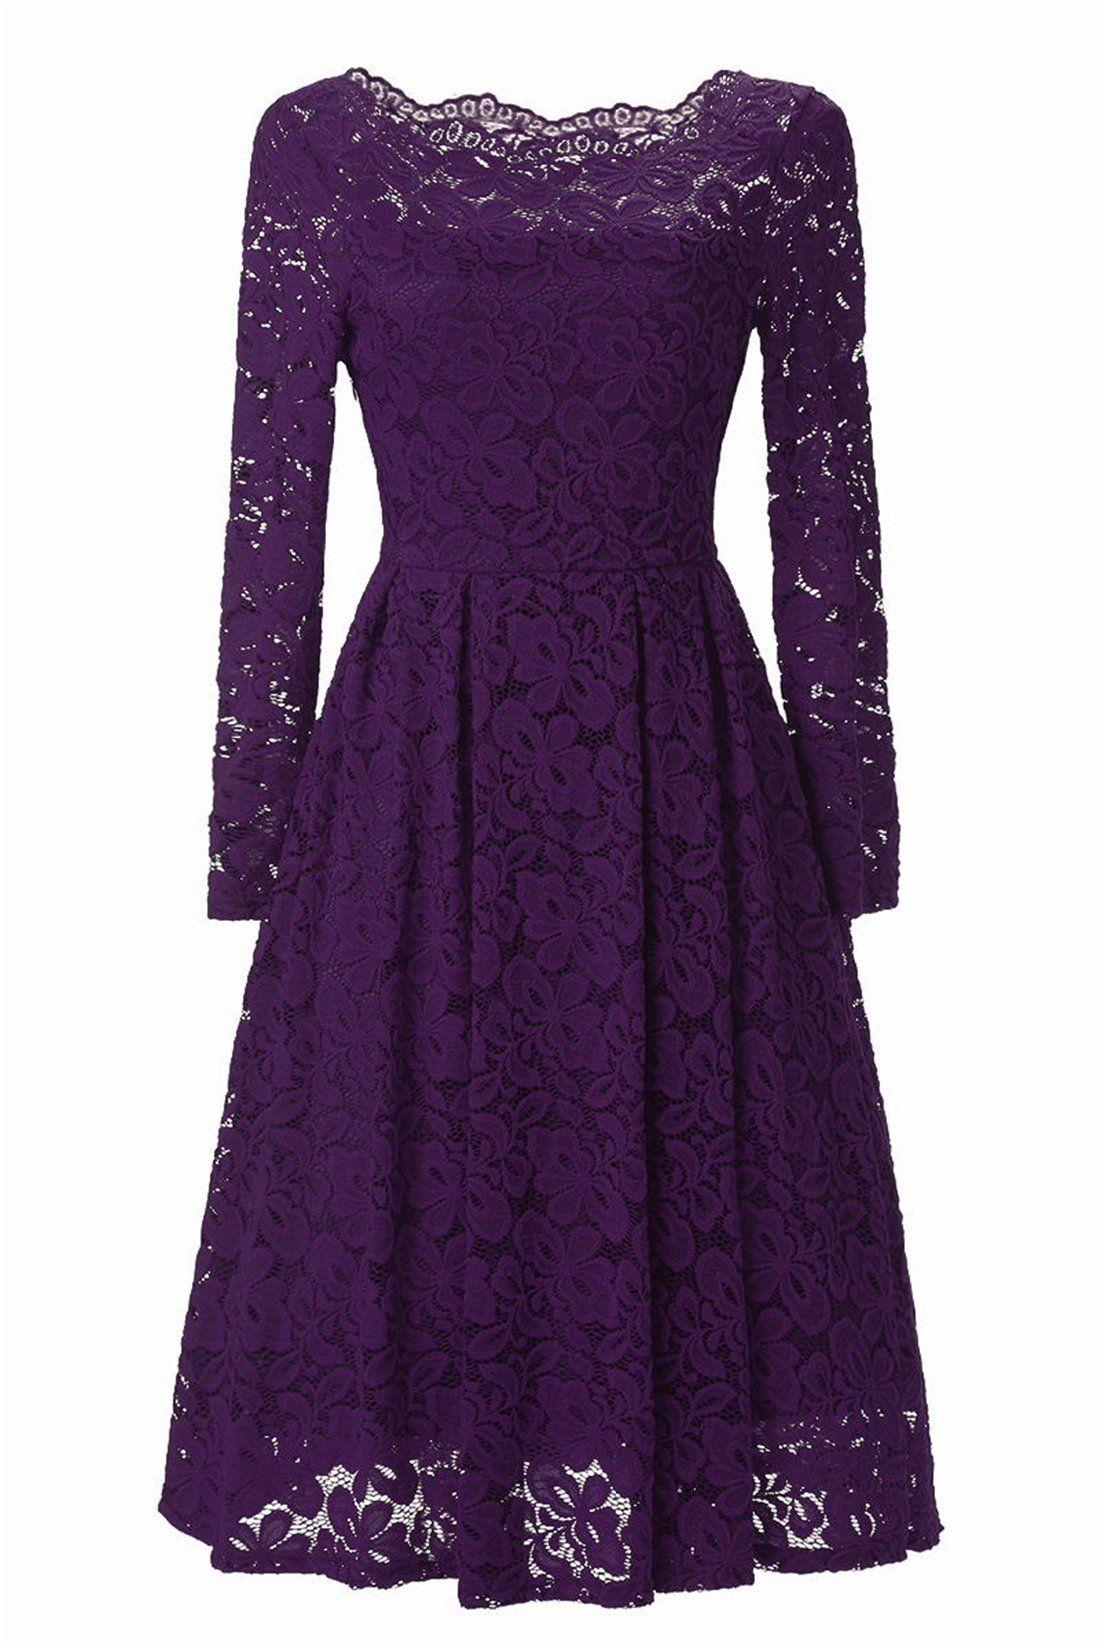 Lanierwedding short prom dresses cheap wedding guest dresses